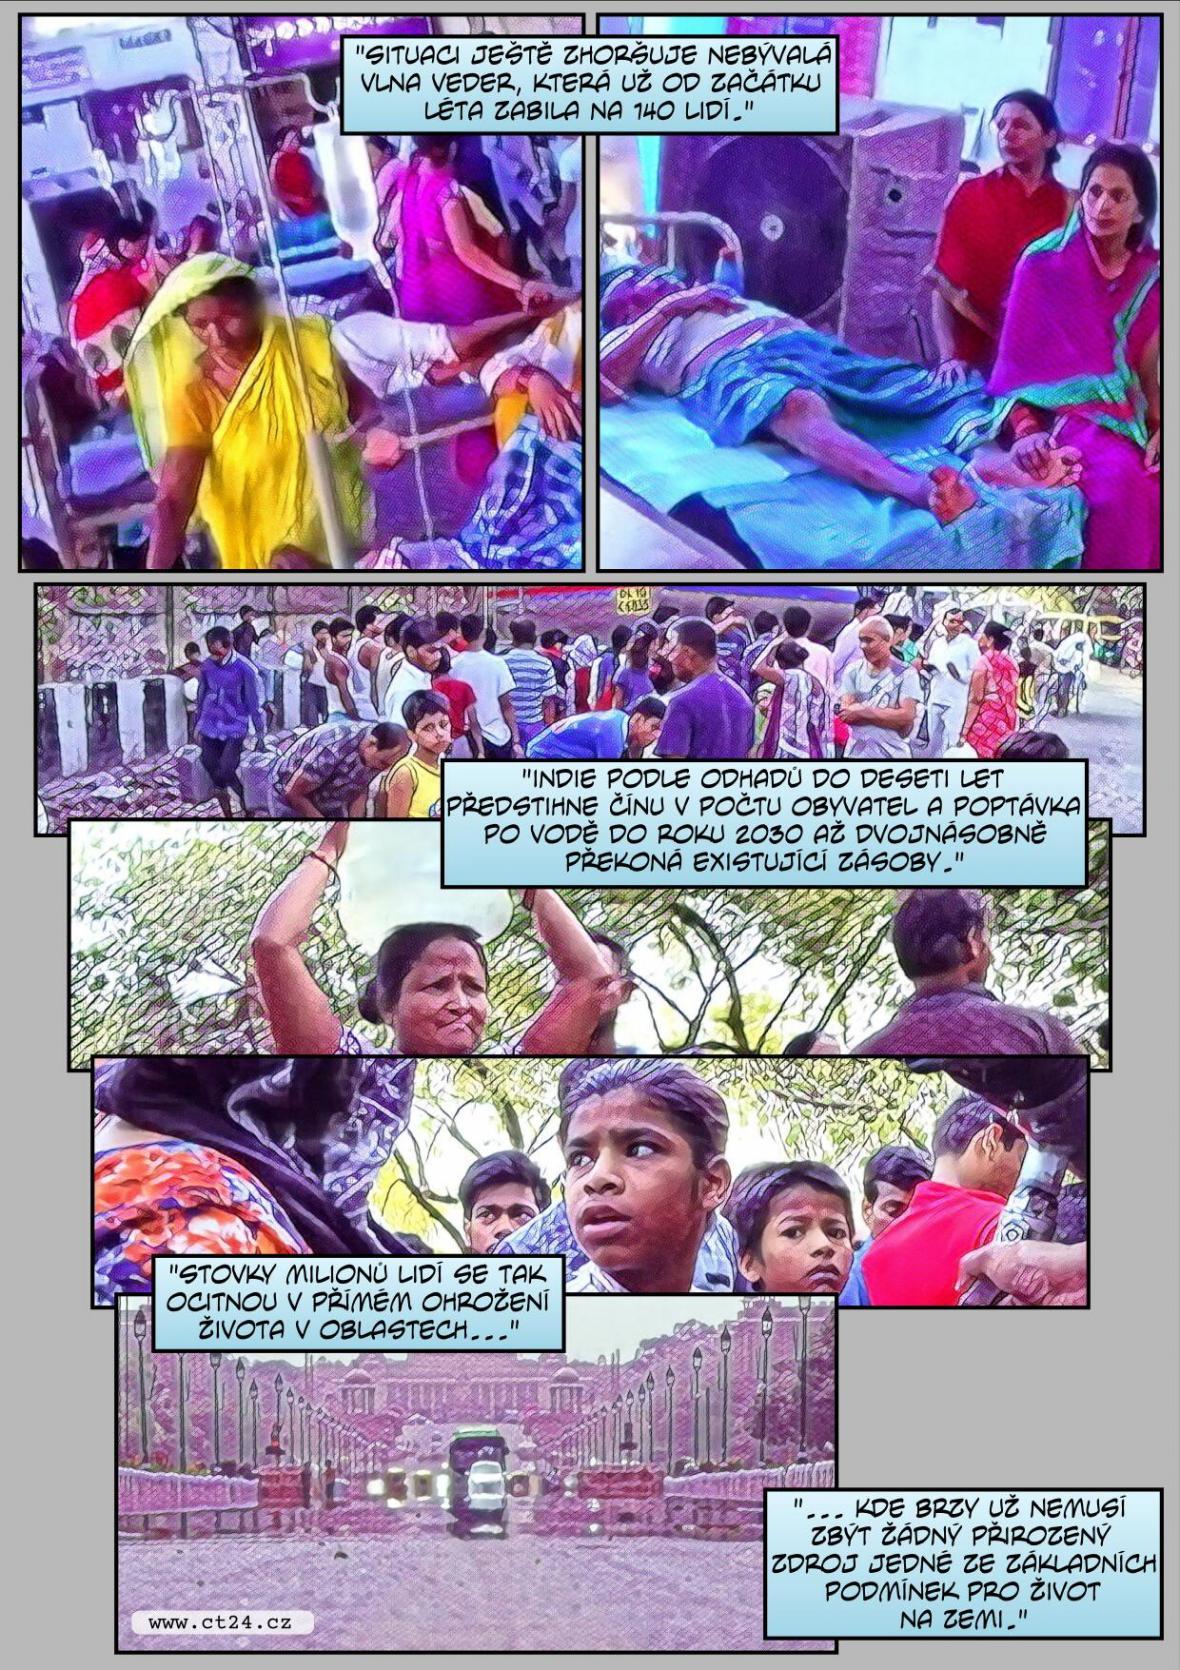 Komiks: Indie čelí nedostatku vody